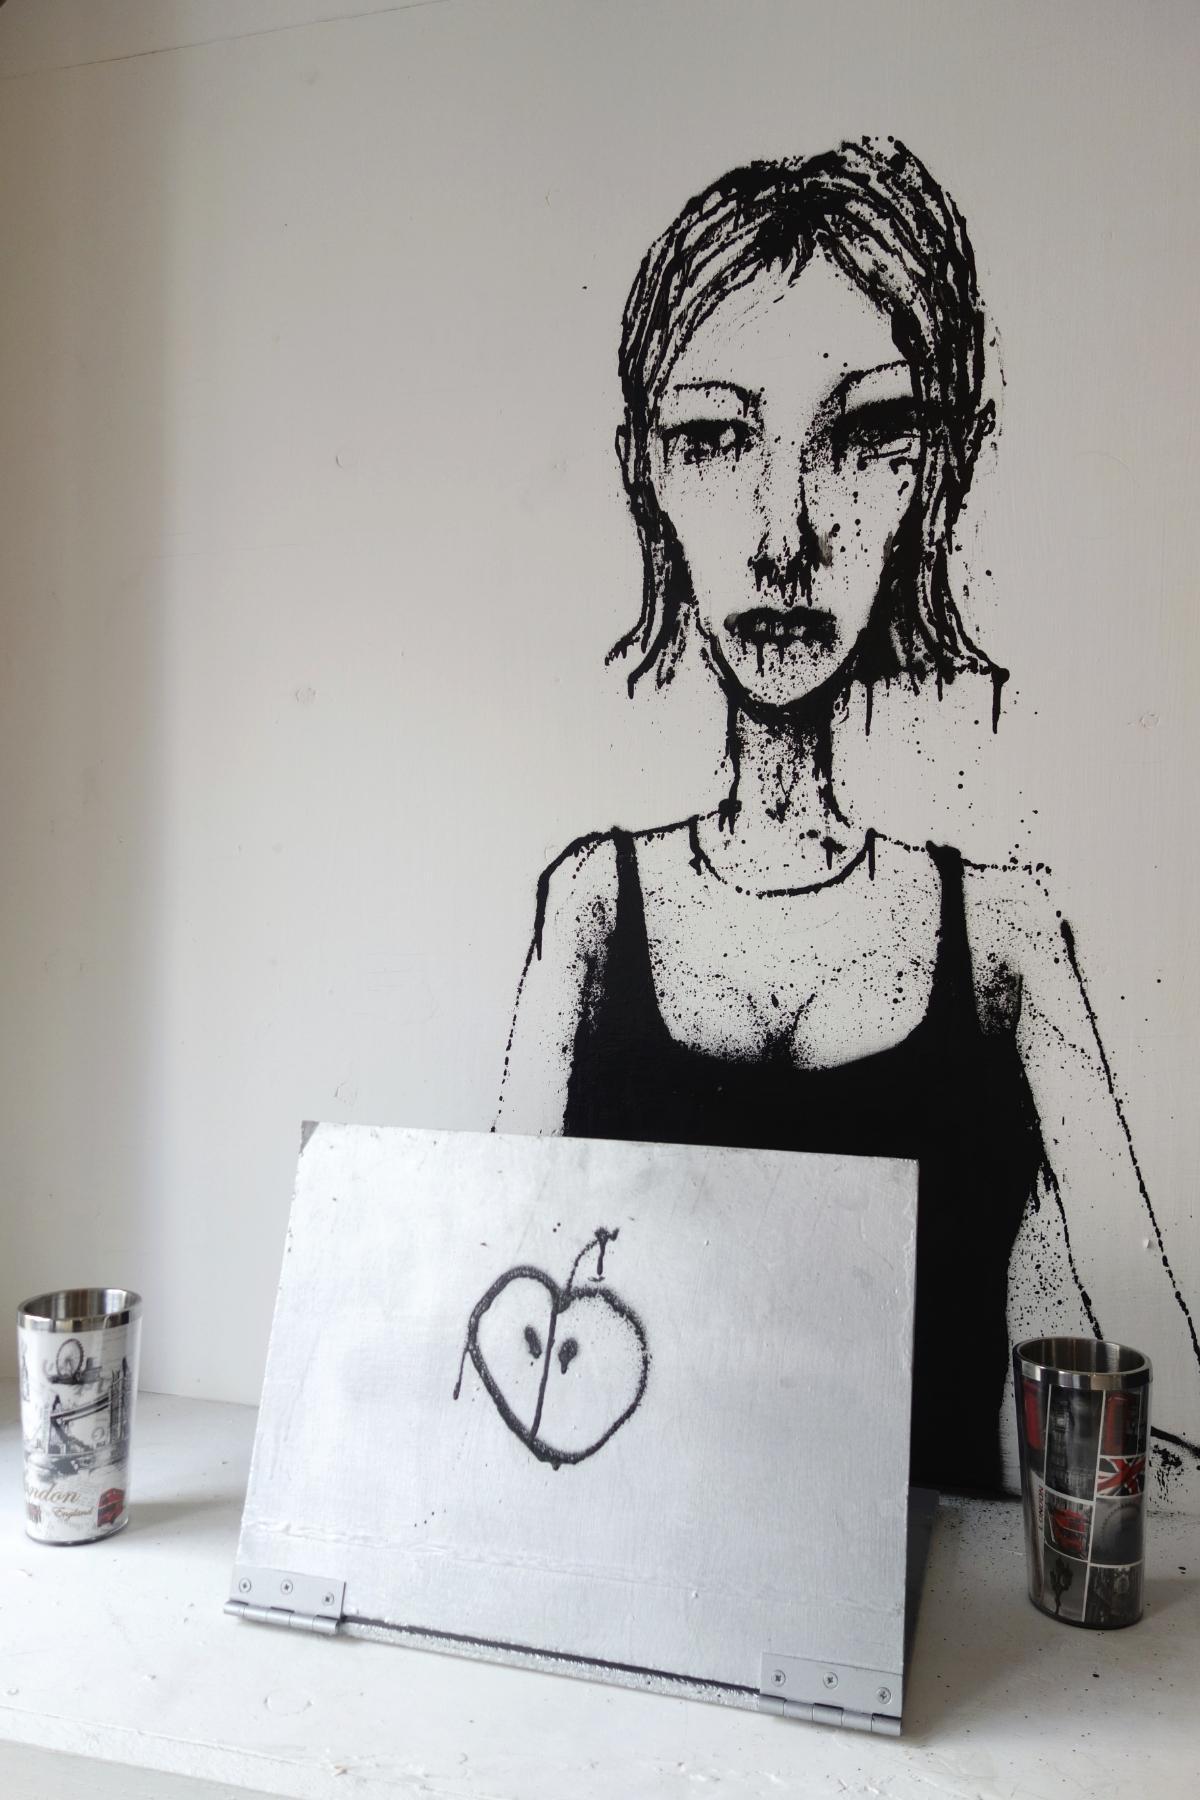 Gallery receptionist.